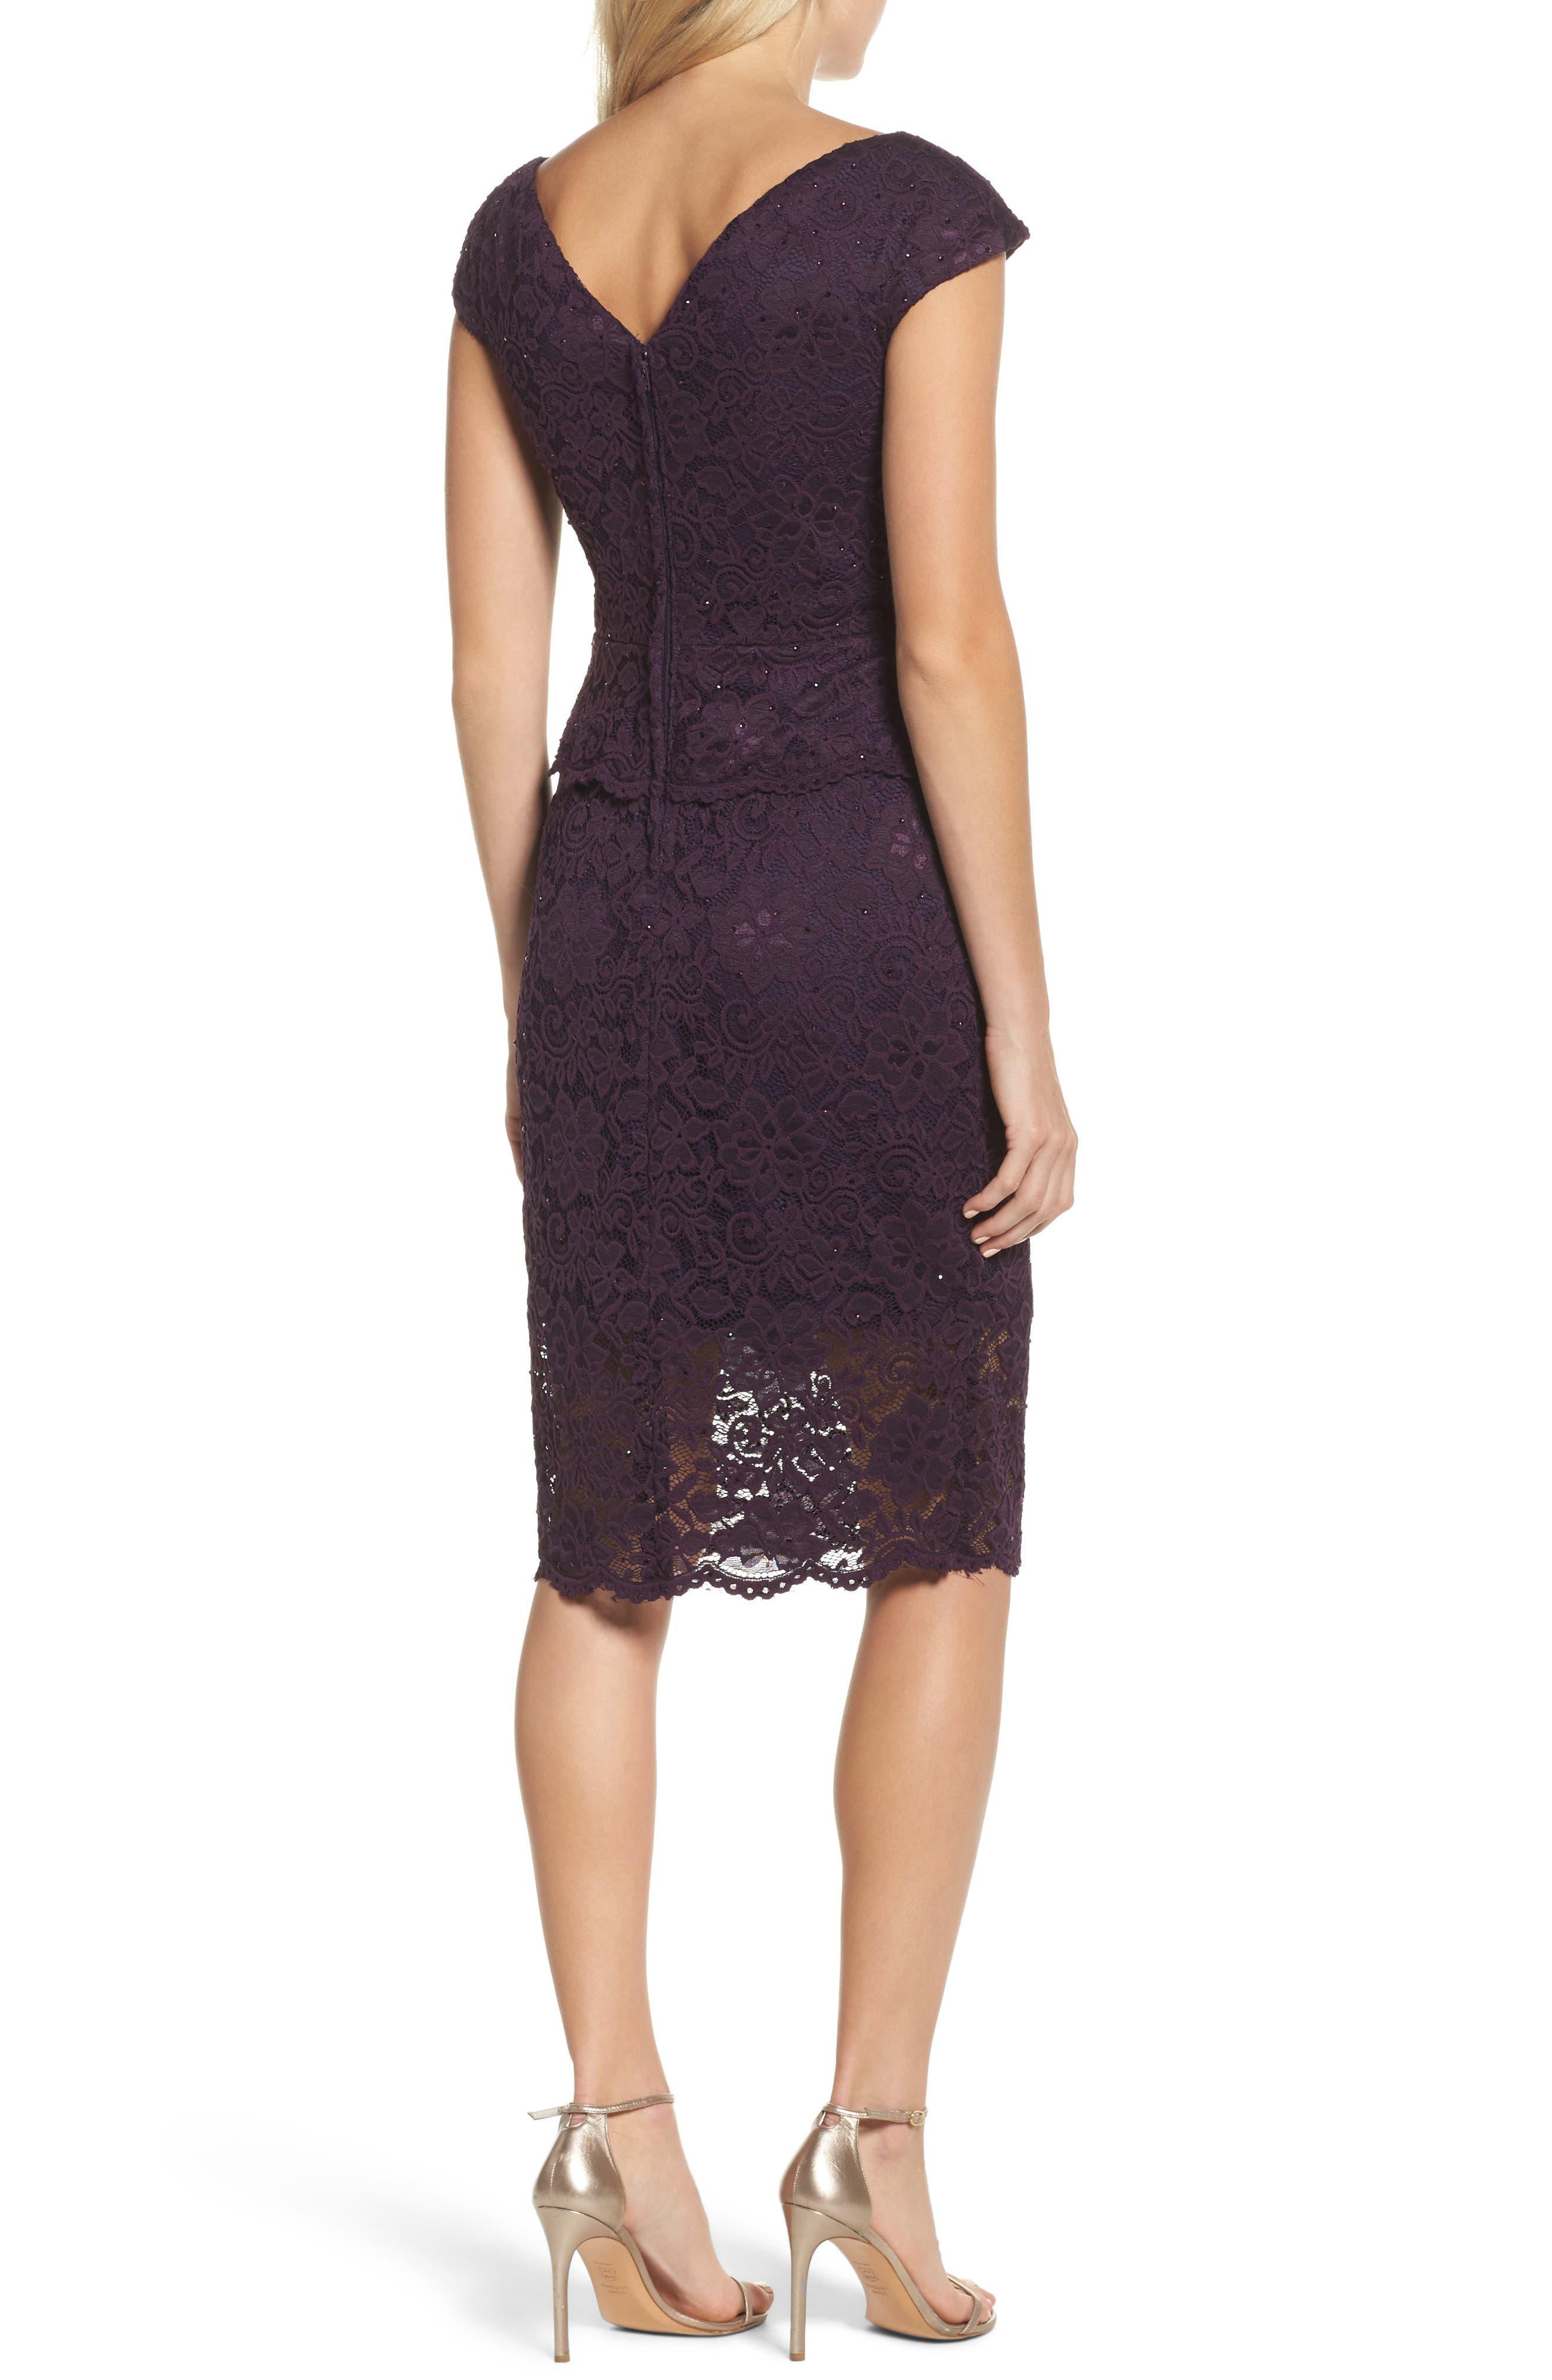 LA FEMME, Embellished Lace Sheath Dress, Alternate thumbnail 2, color, 501